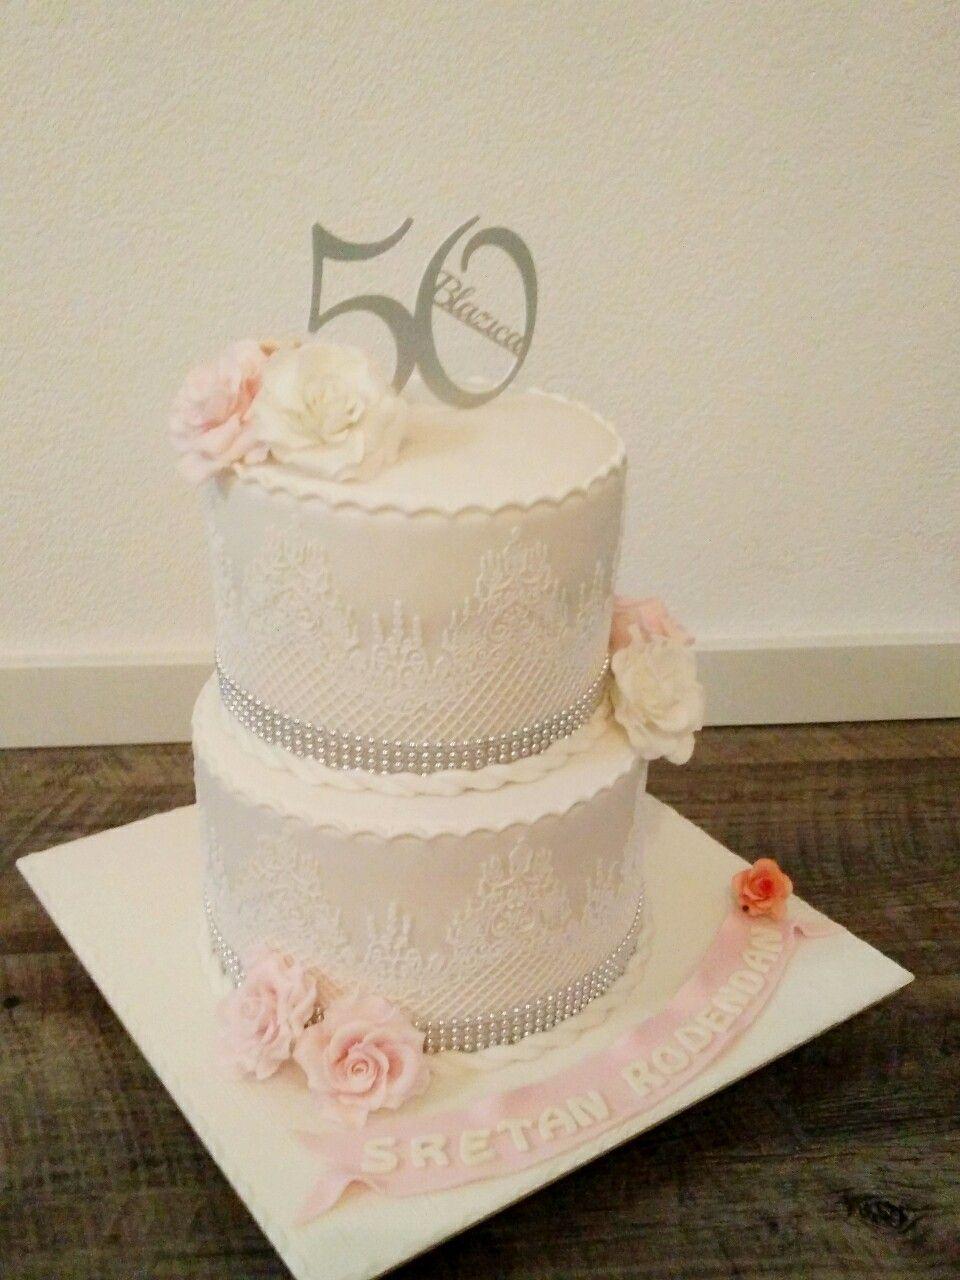 50 ti rođendan Torta za 50   ti rođendan | My home made cakes | Pinterest | 50th  50 ti rođendan